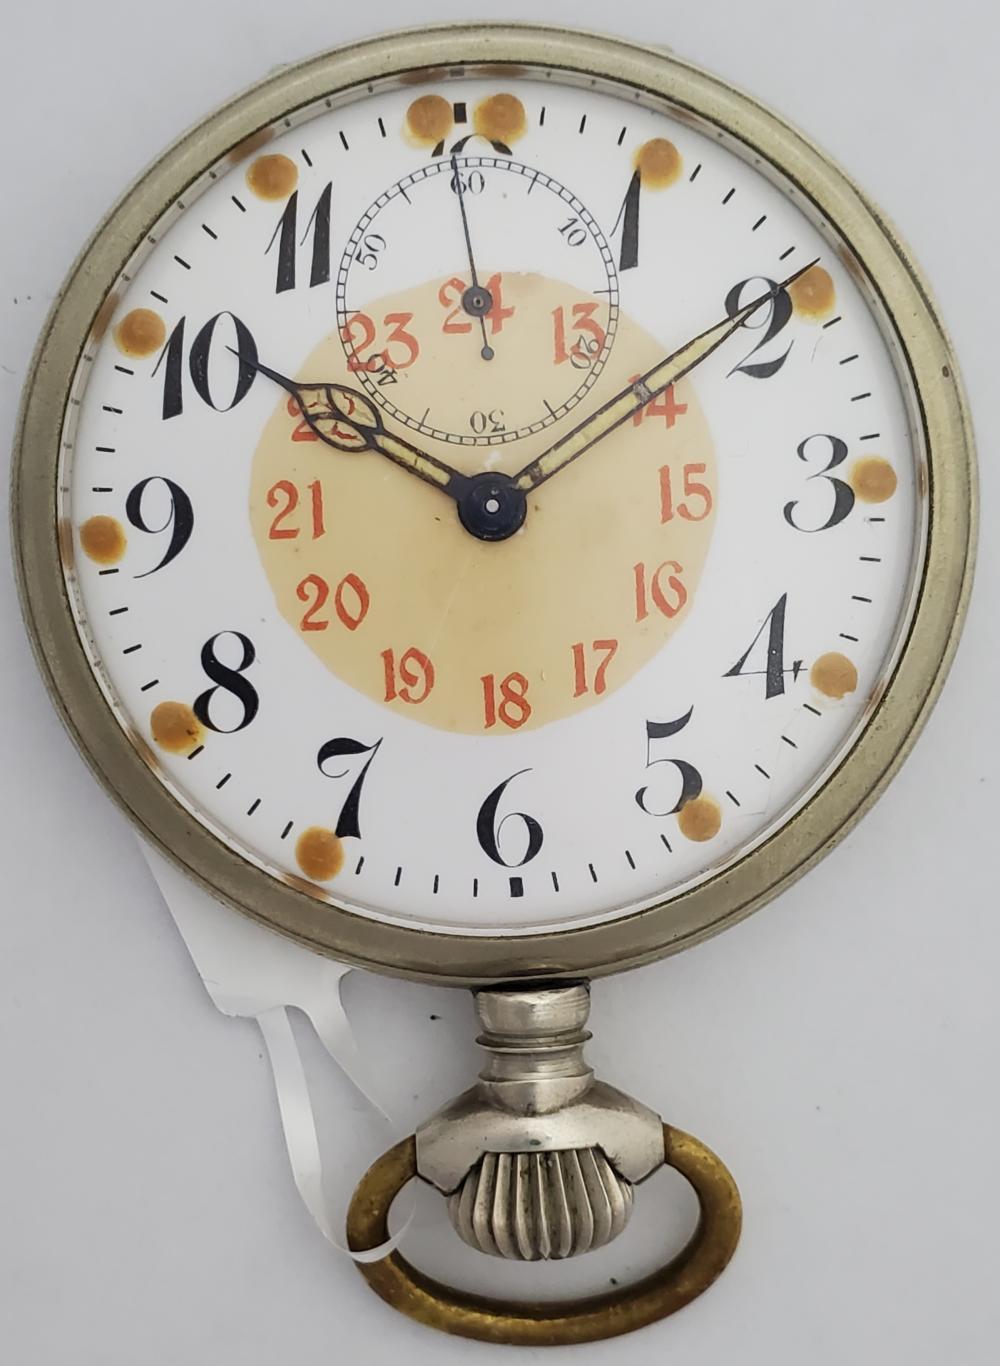 WWI German Airplane Dash Clock Revue